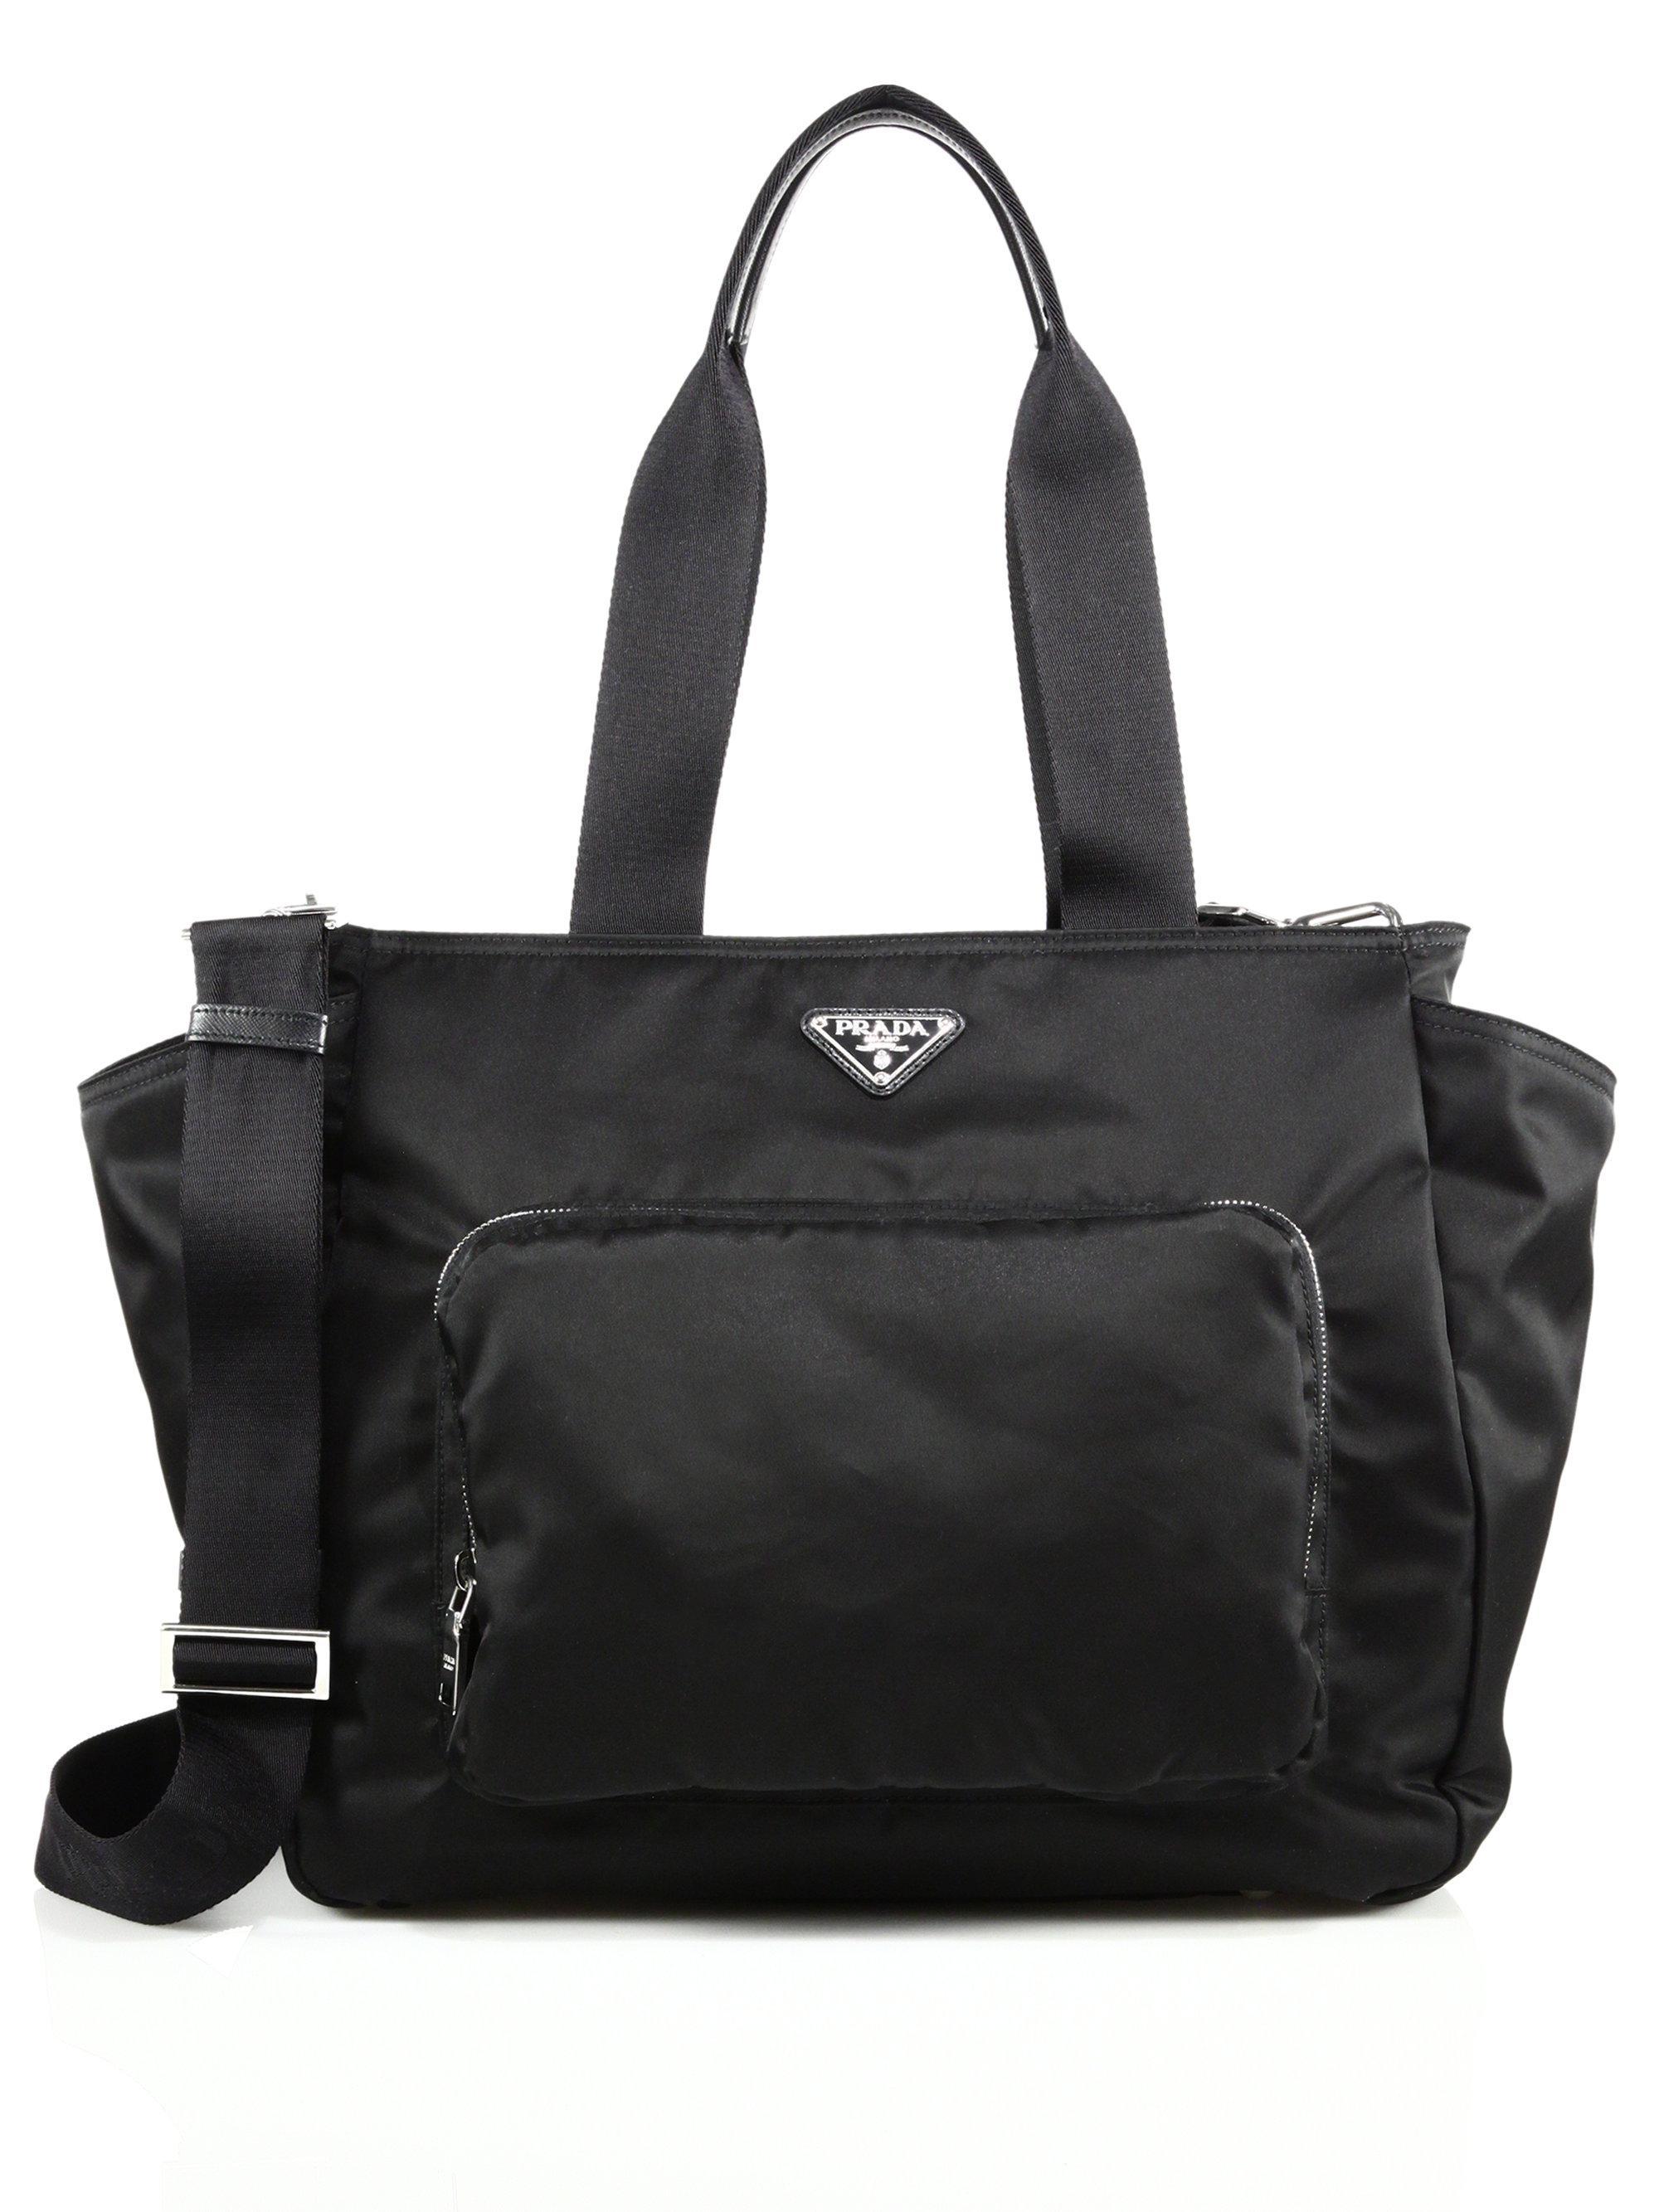 Prada Women S Black Nylon Diaper Bag